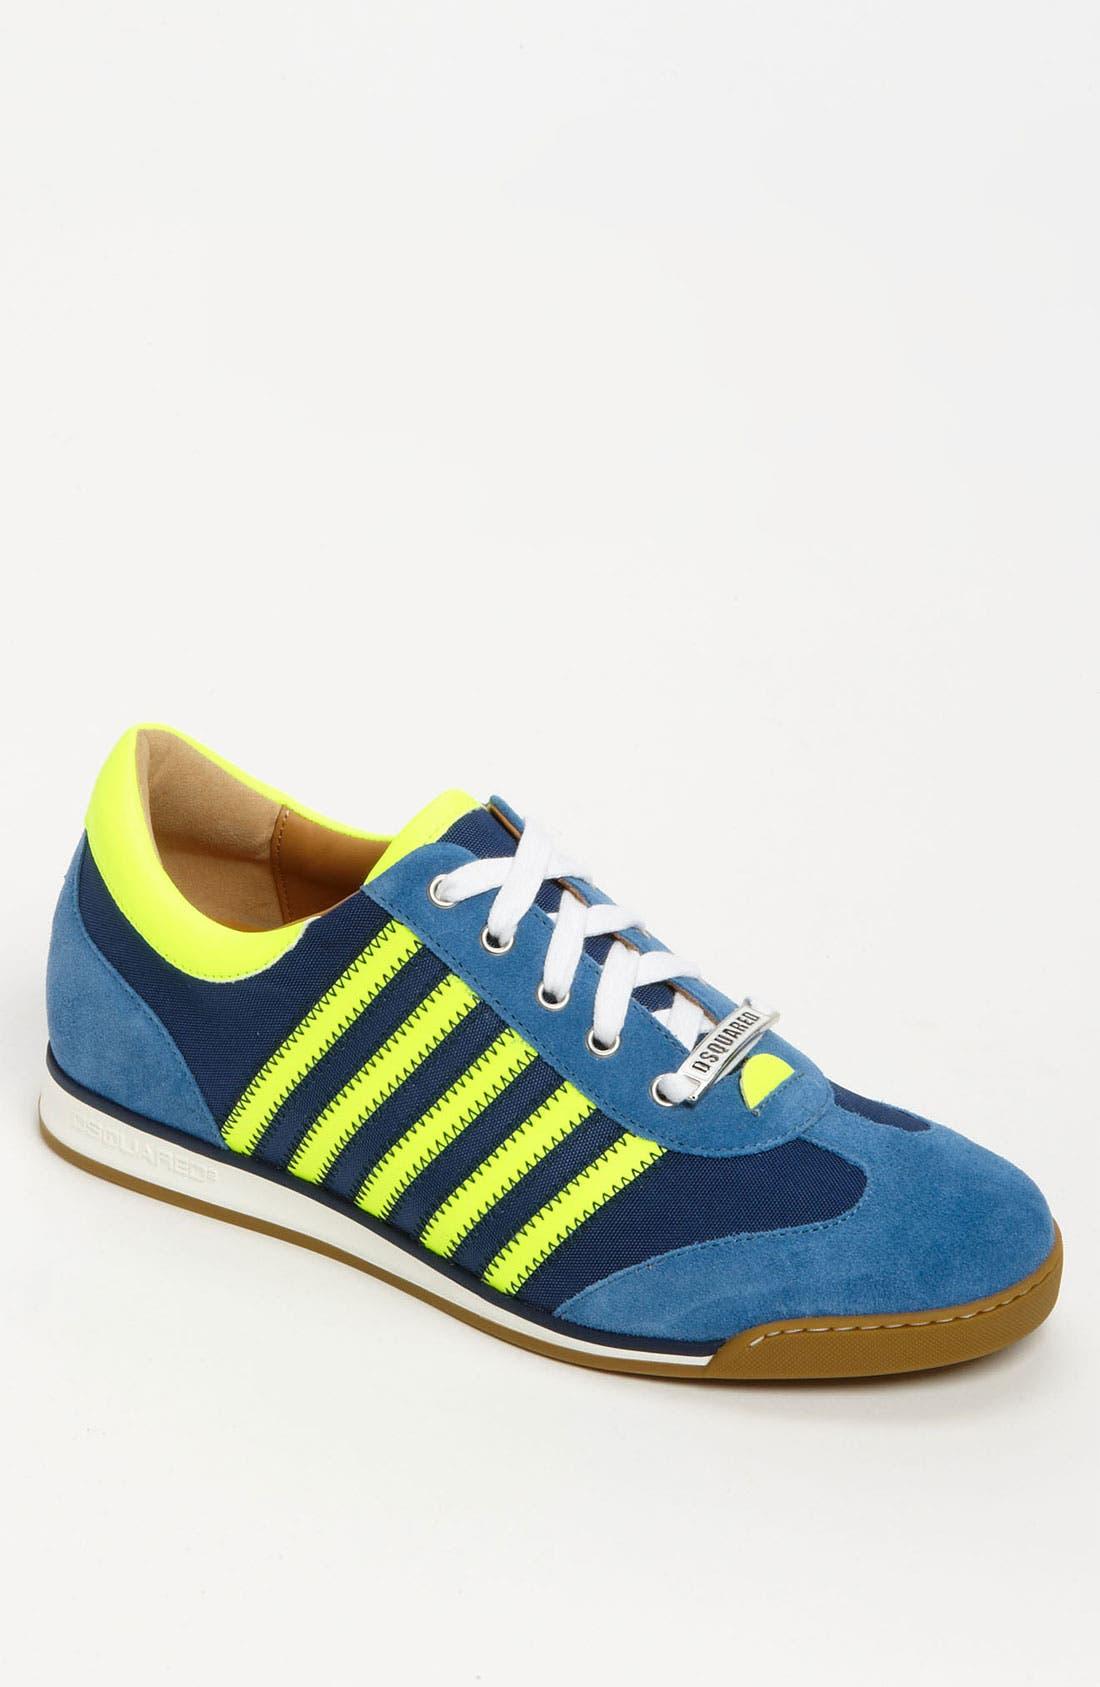 Main Image - Dsquared2 '419T' Sneaker